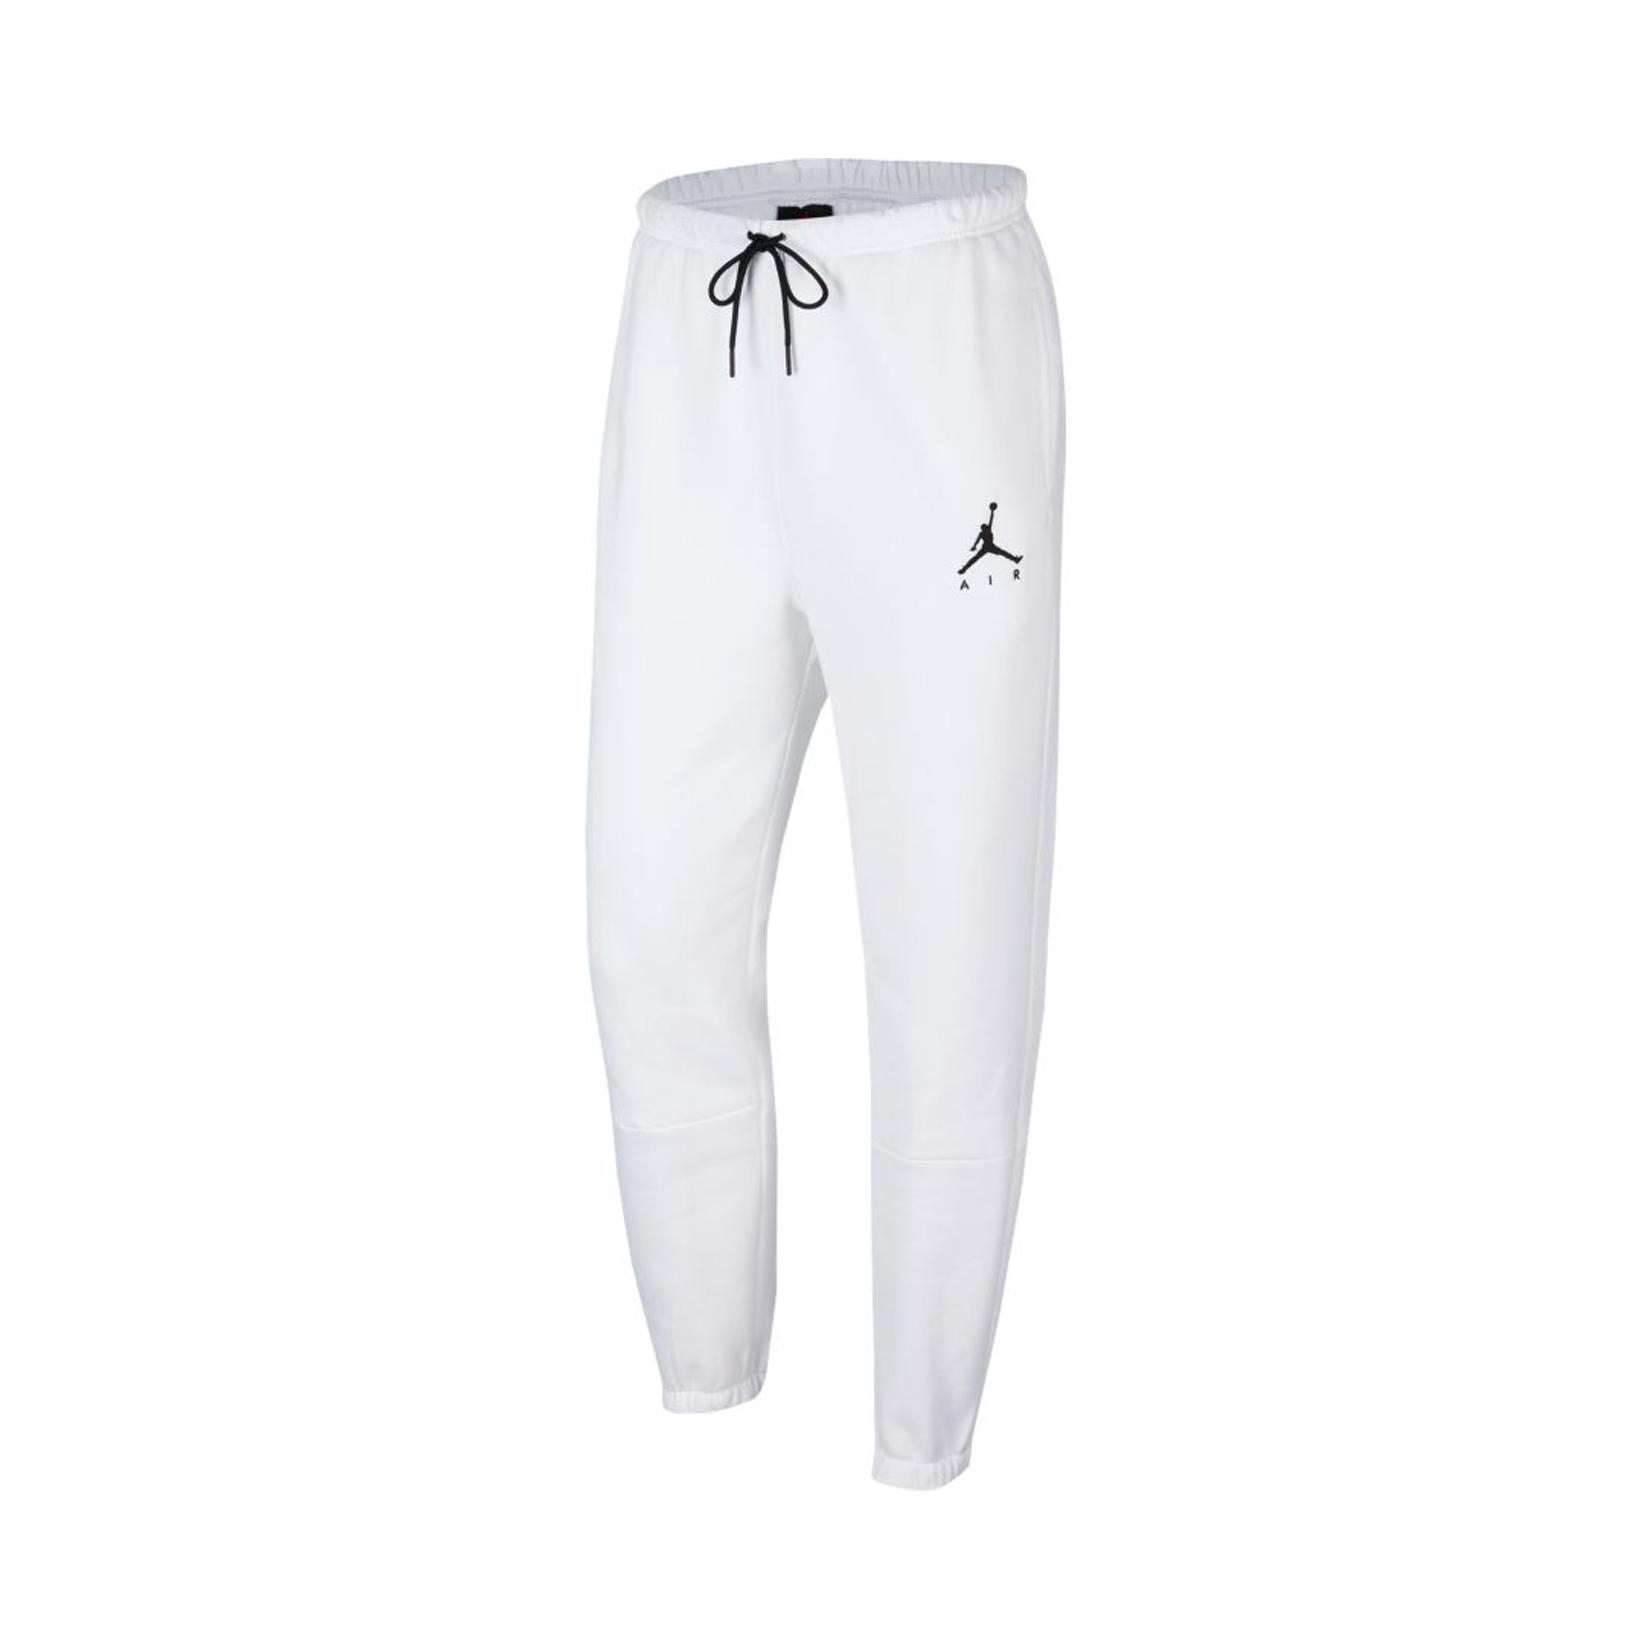 Jordan Jumpman Air Fleece Pants White